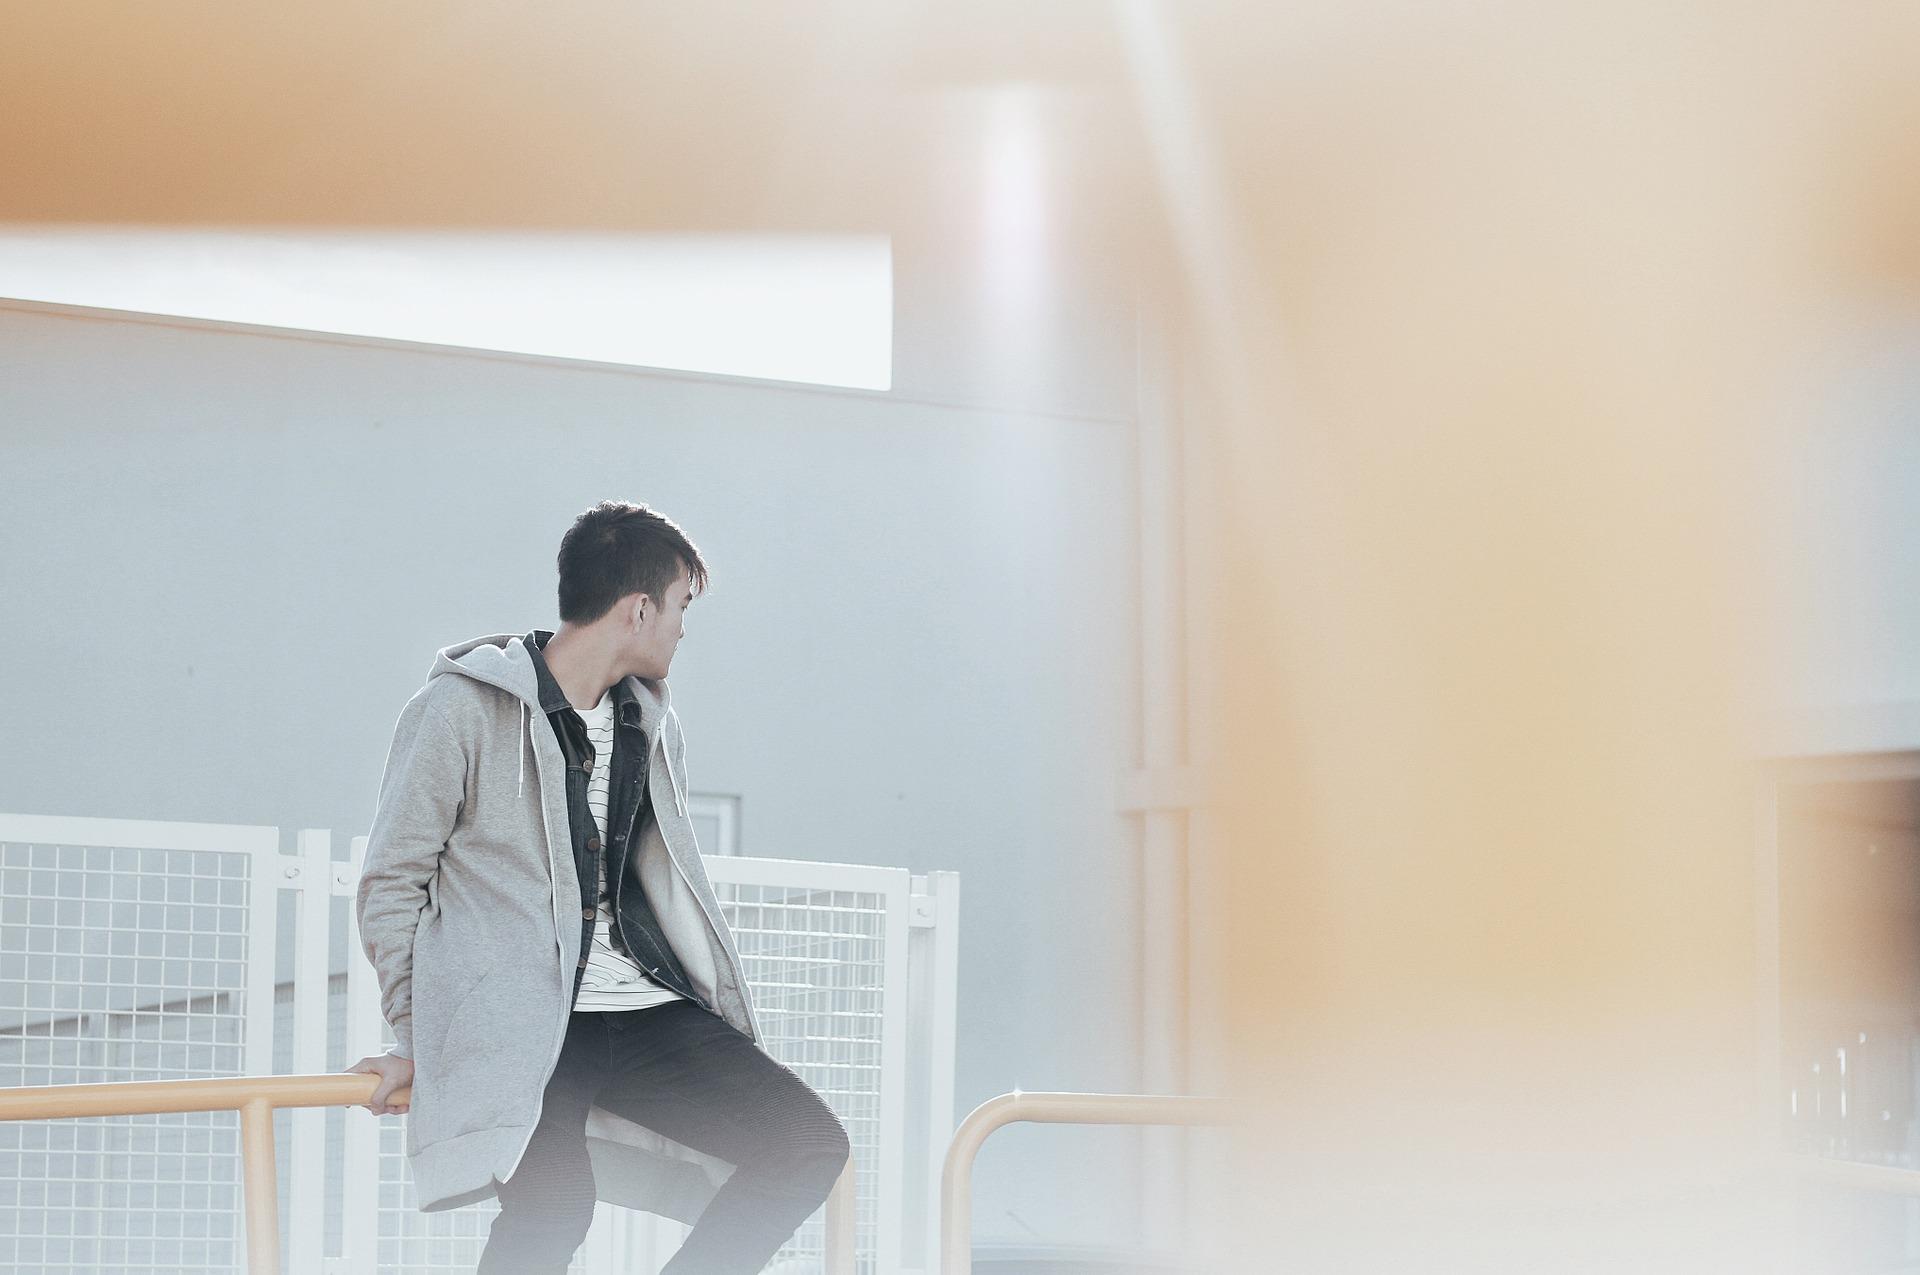 Teenager sitting on a railing